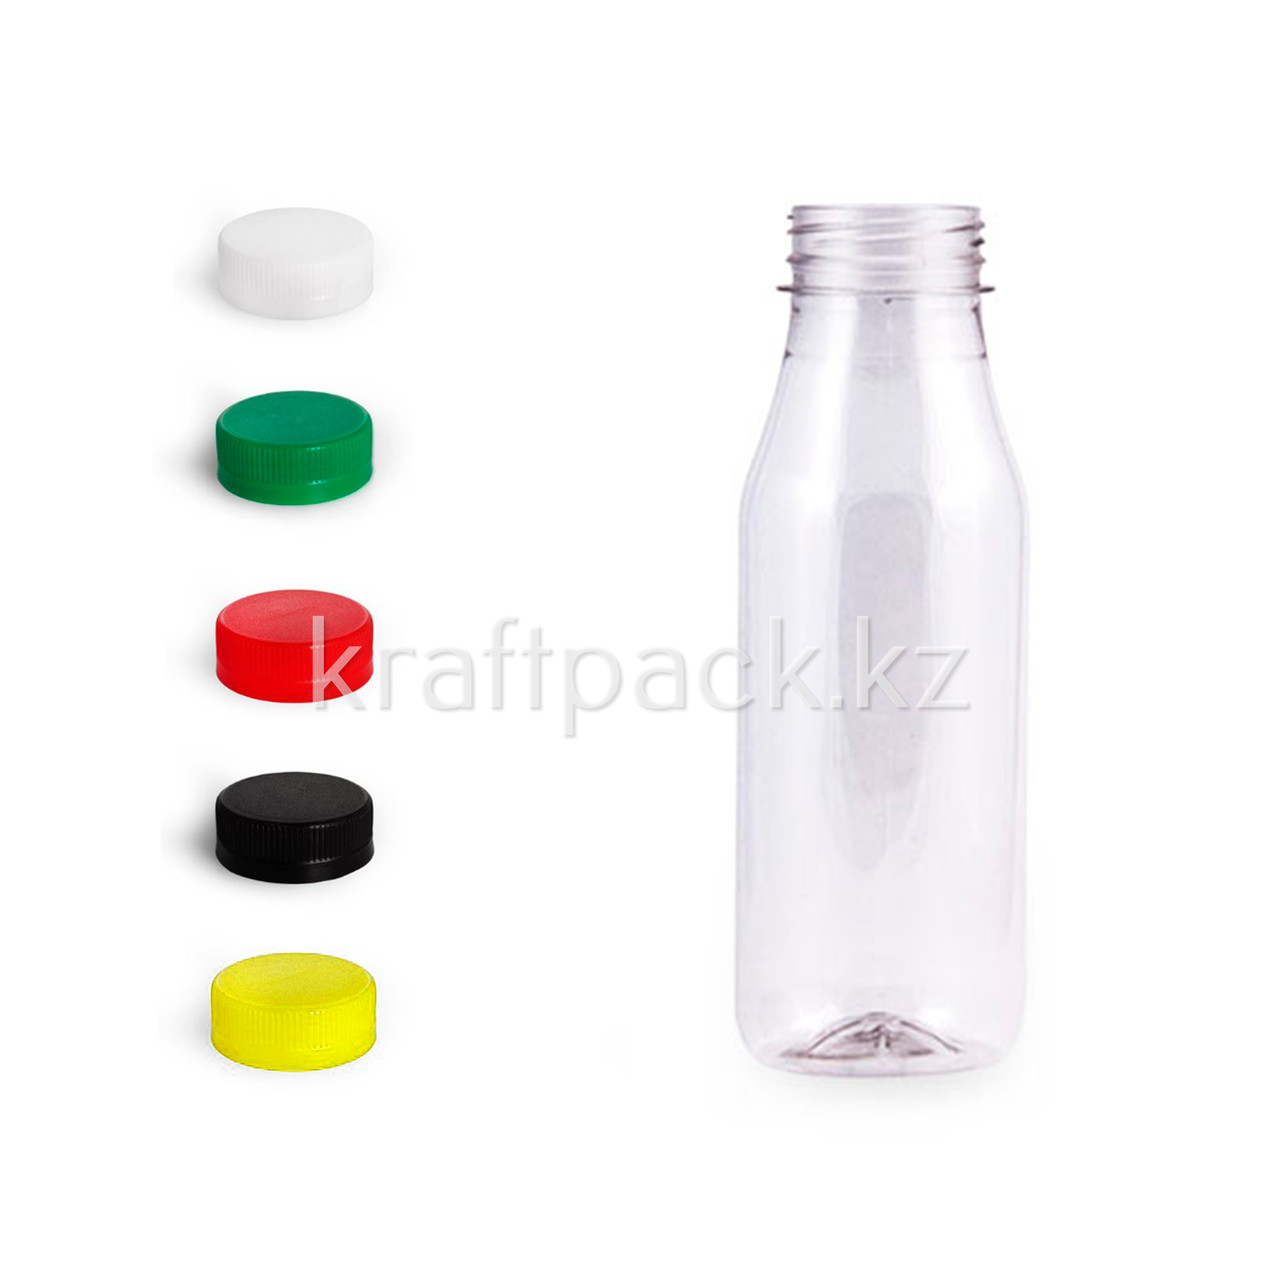 Бутылка 300мл, с широким горлом 38мм «Круглая Стандарт» (100шт/уп) ( Цвет крышки на выбор)